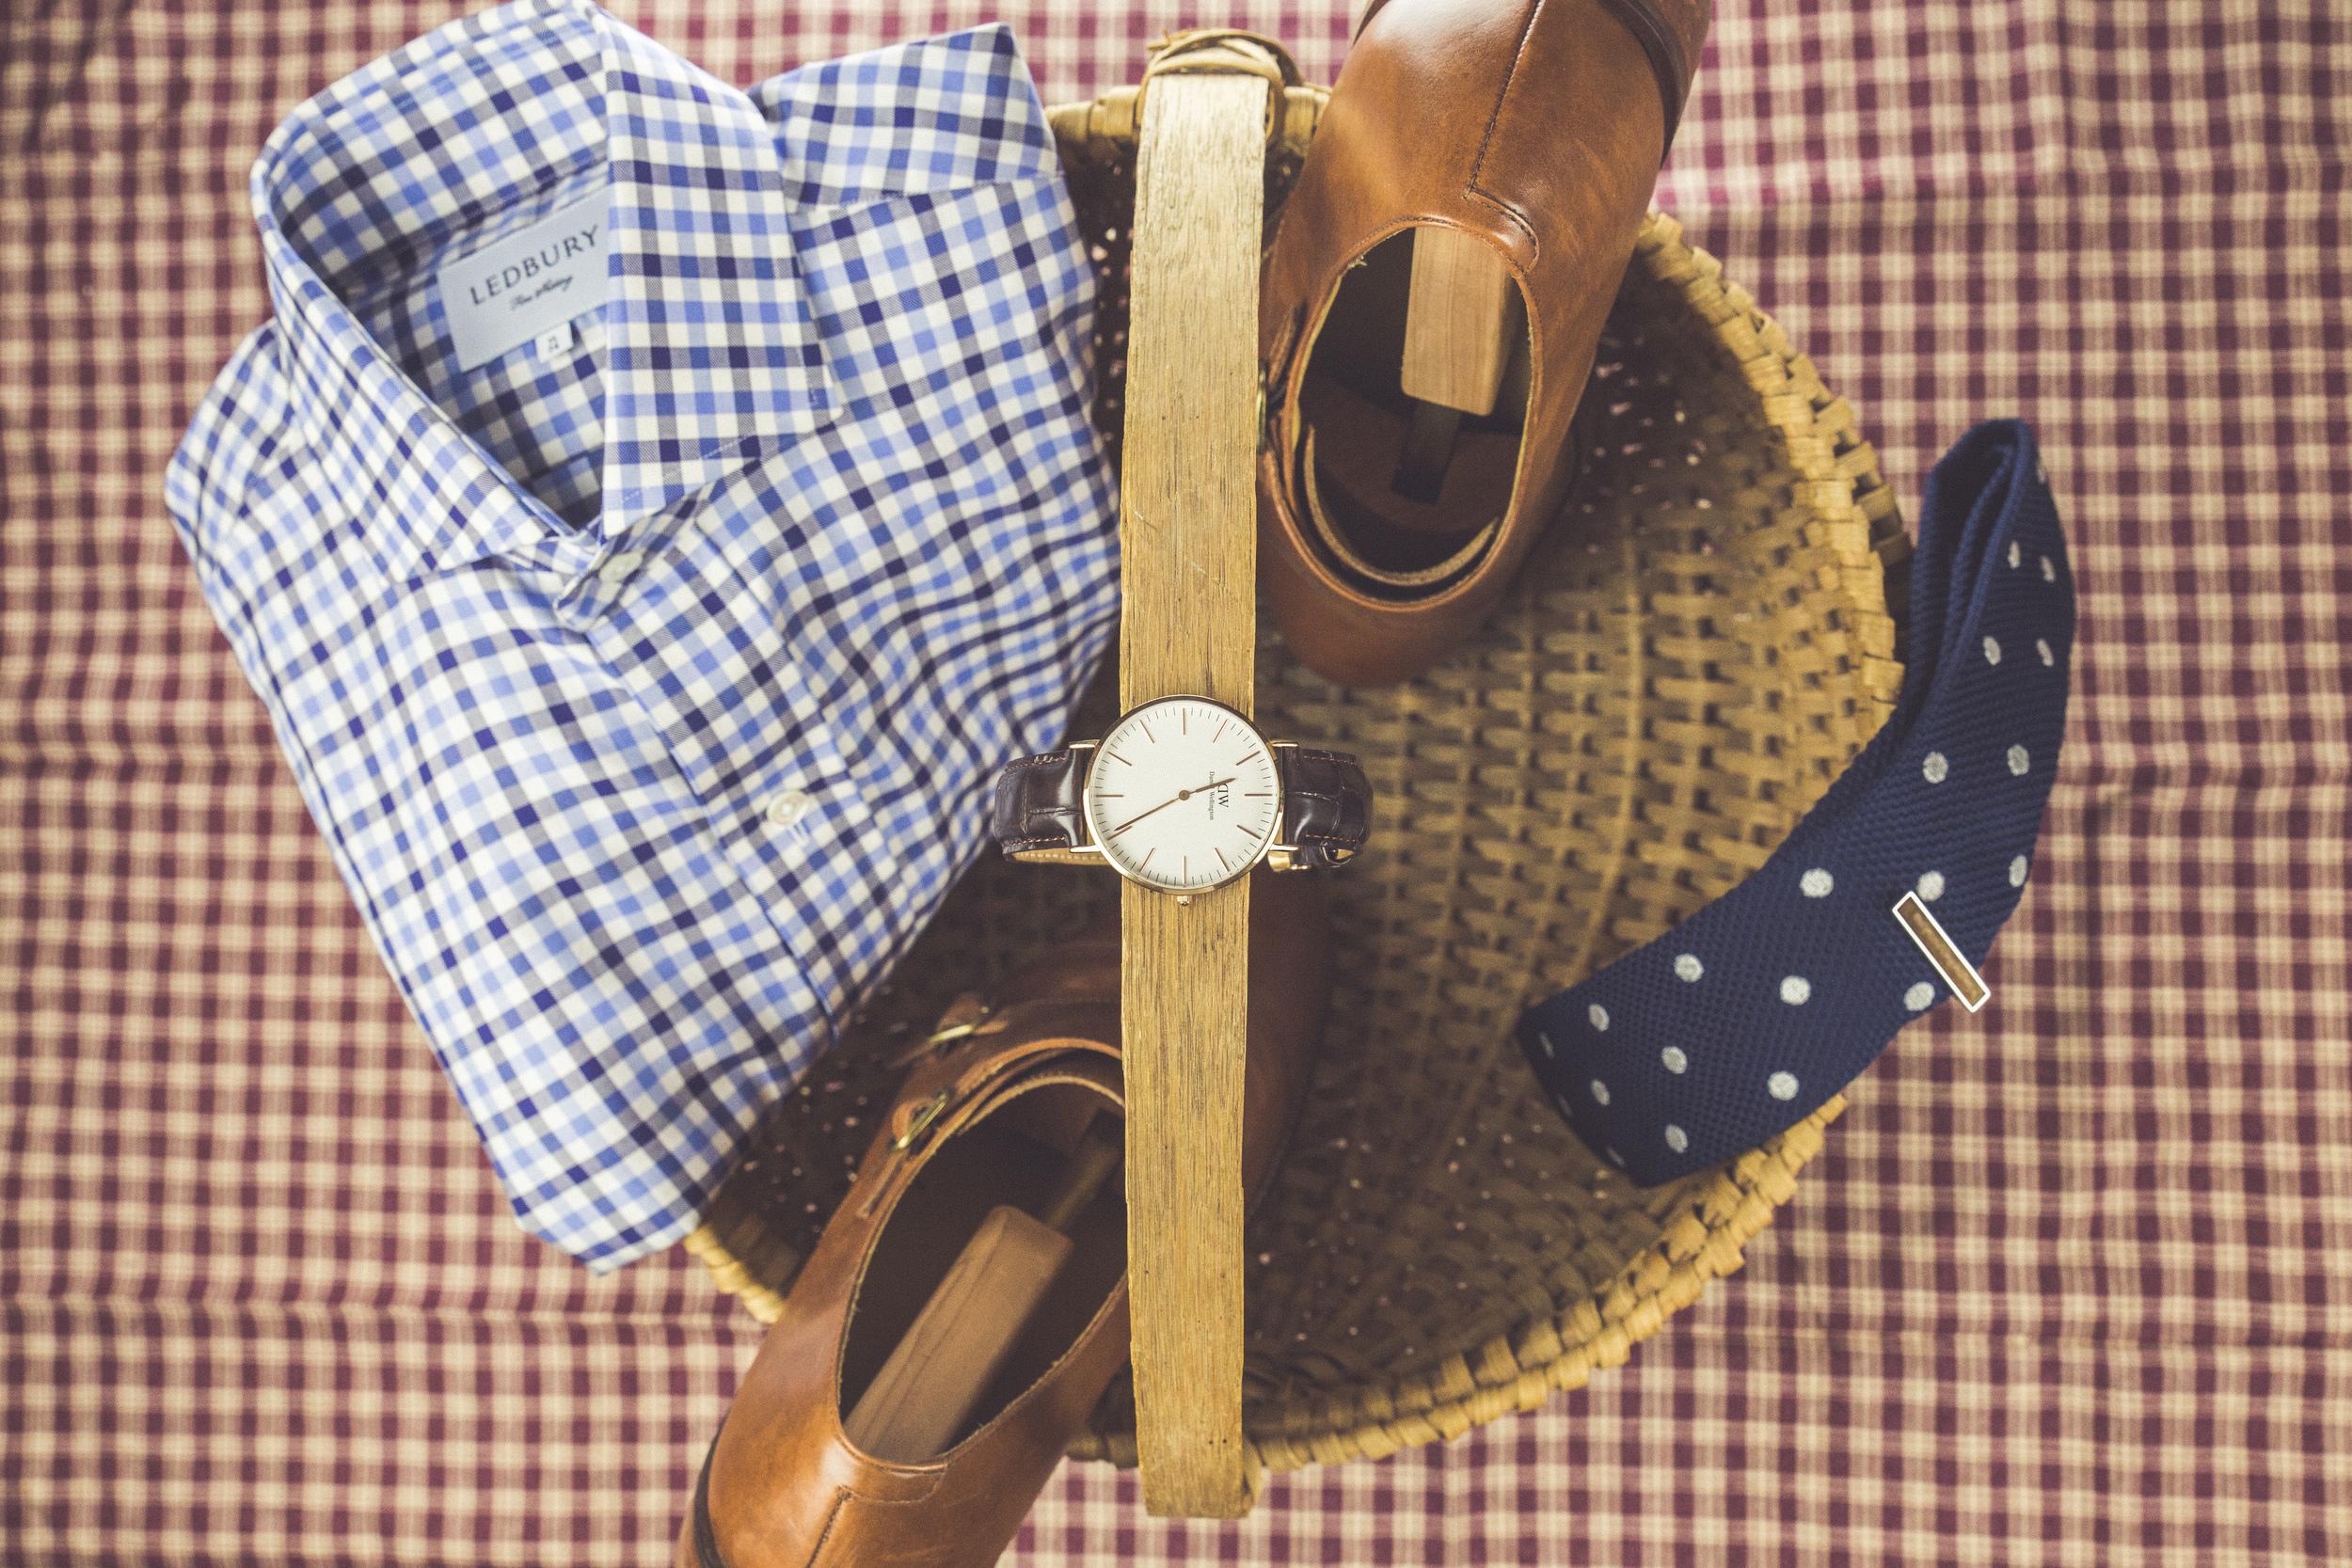 Shirt: Ledbury, Watch: Daniel Wellington, Shoes: Cole Haan.